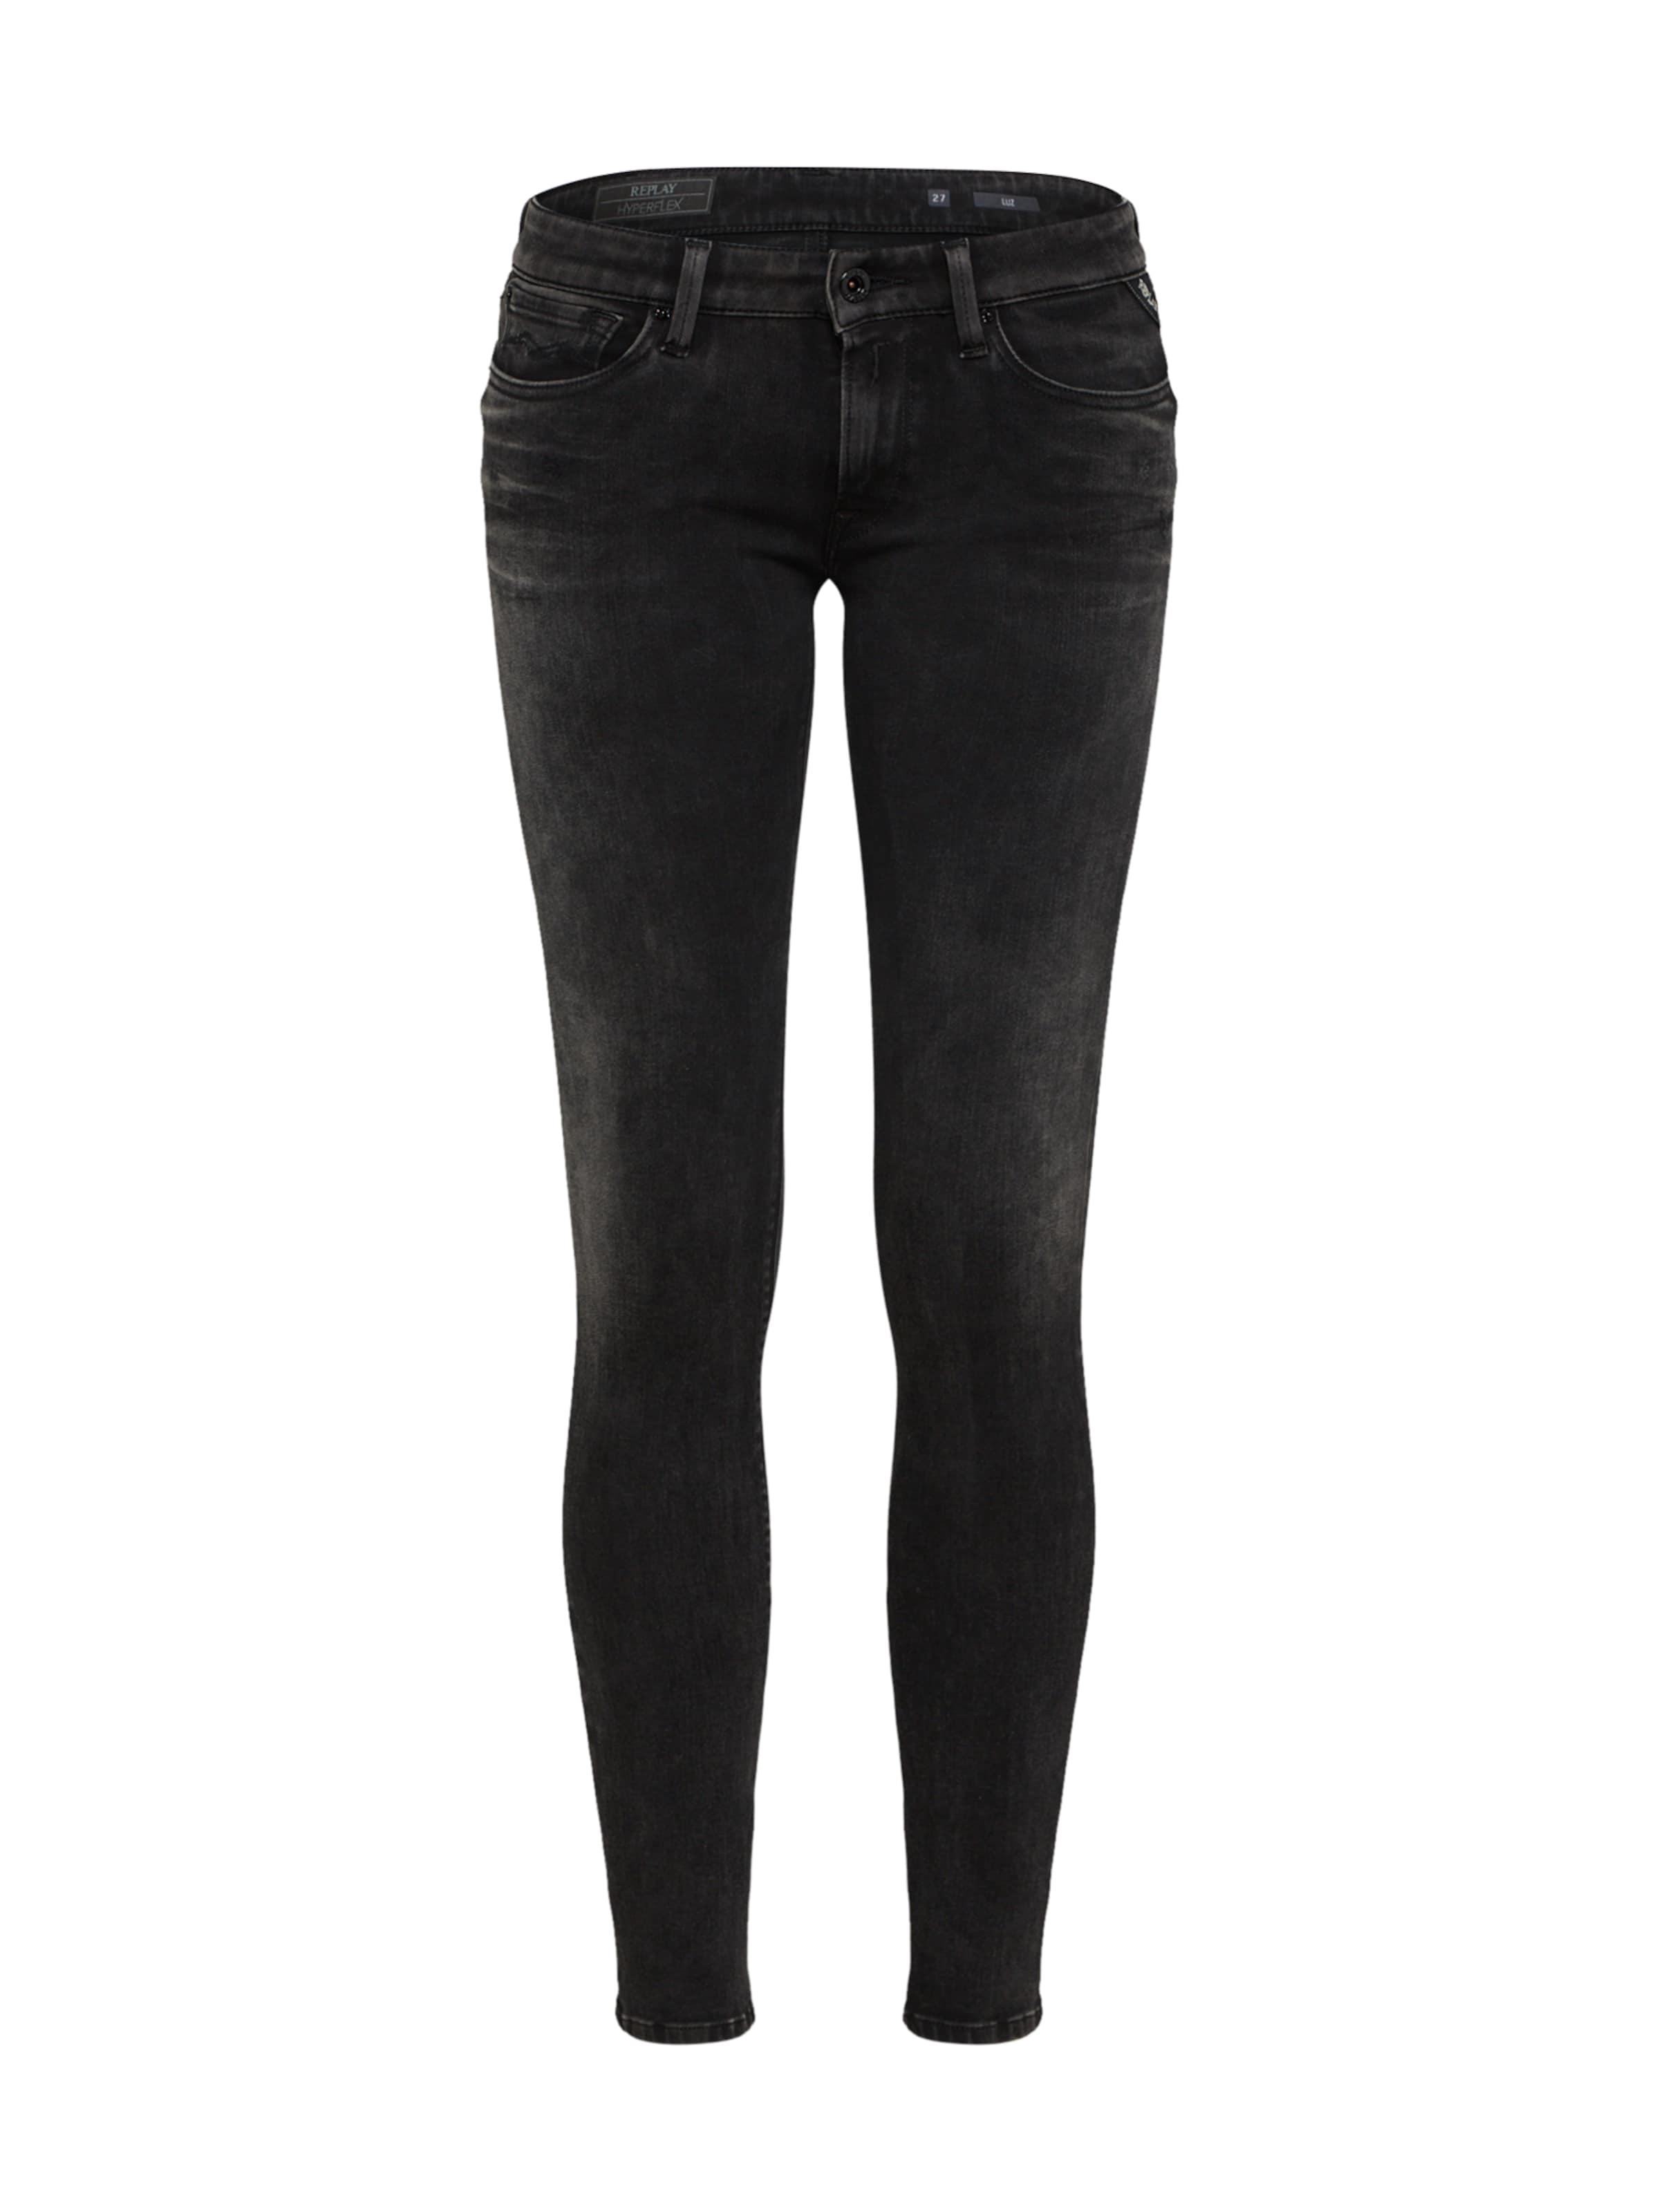 In Black Replay Jeans 'luz Hyperflex' Denim j3RL4Aq5